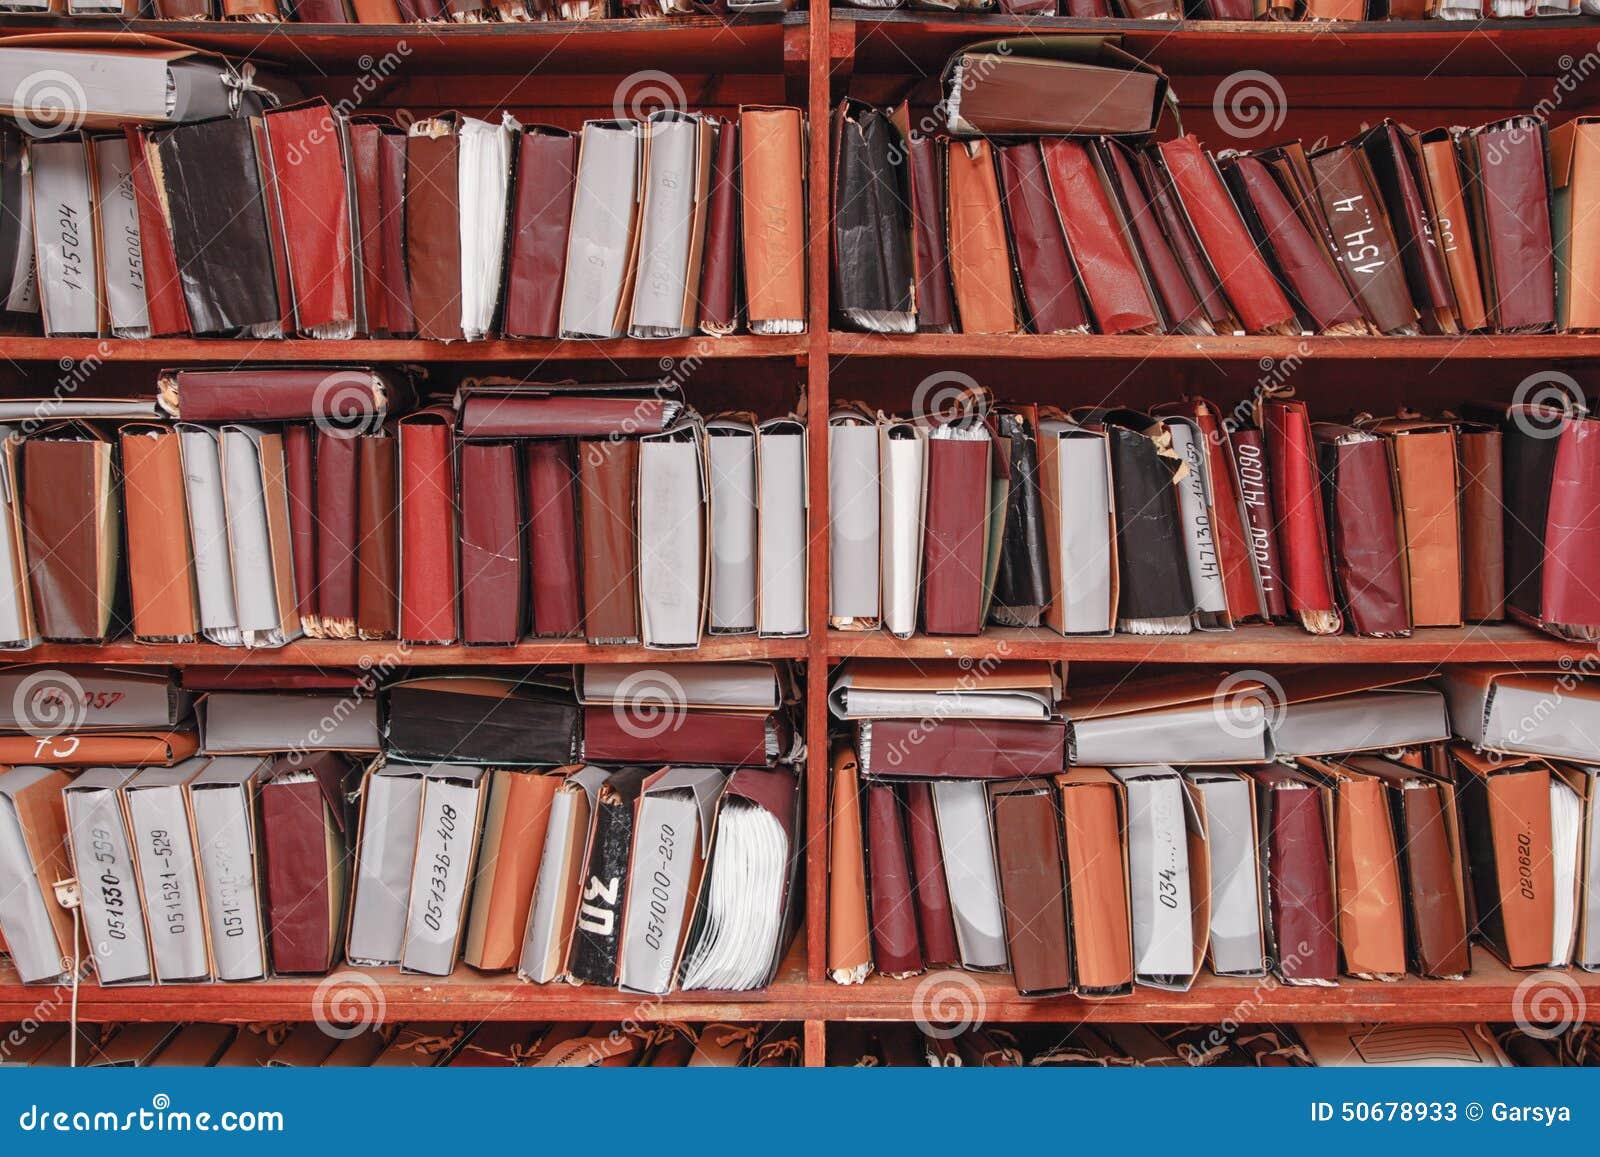 Download 在档案里堆积的纸张文件 库存图片. 图片 包括有 管理, 命令, 记录, 历史记录, 组织, 保留, 存放处 - 50678933